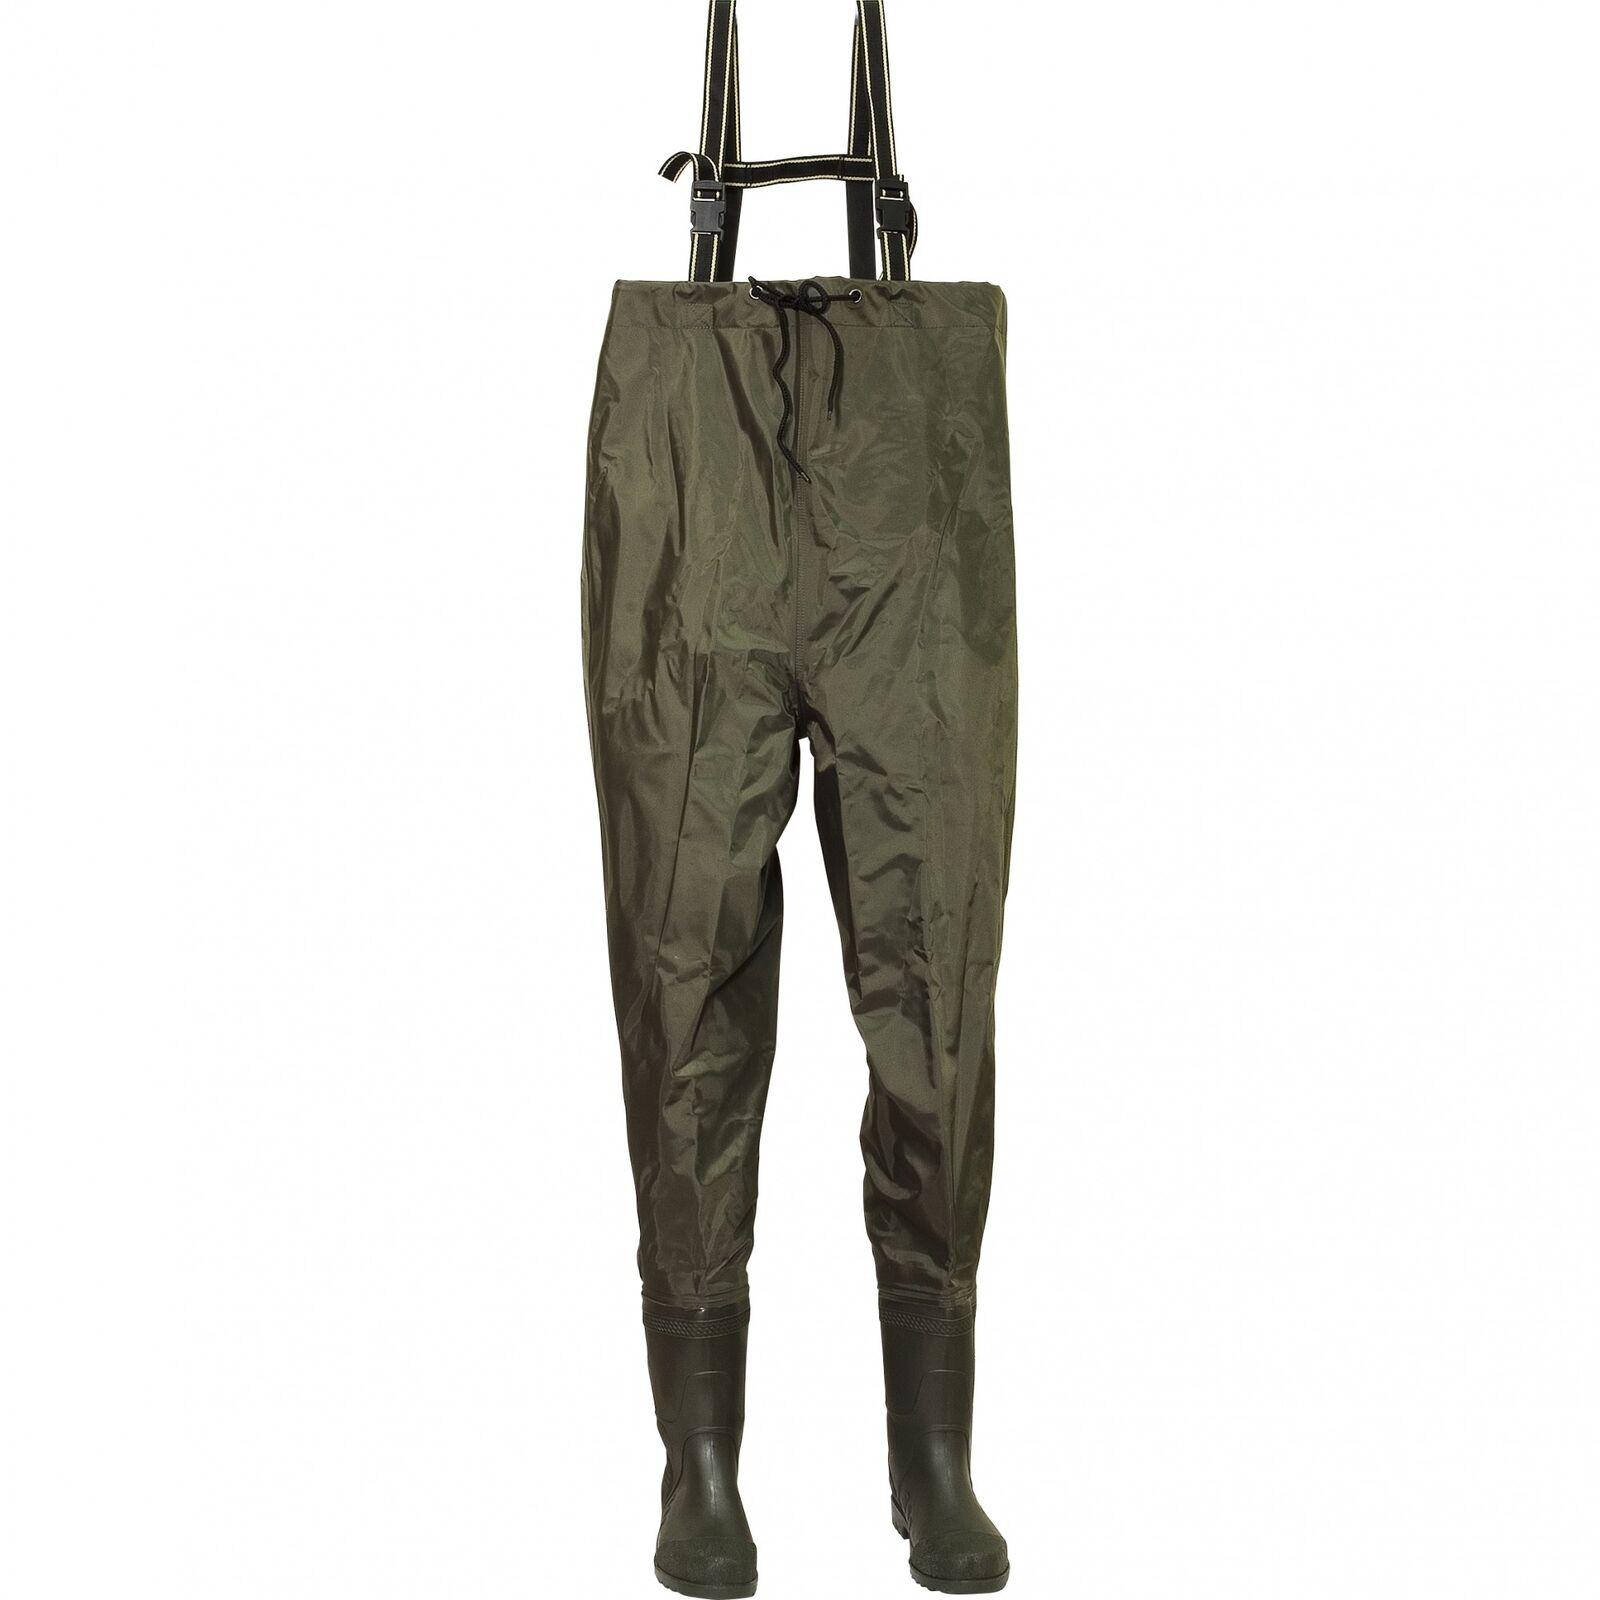 Fladen Wathose Watstiefel Wathosen PVC-Hose Nylonhose Wat-Bekleidung Wader